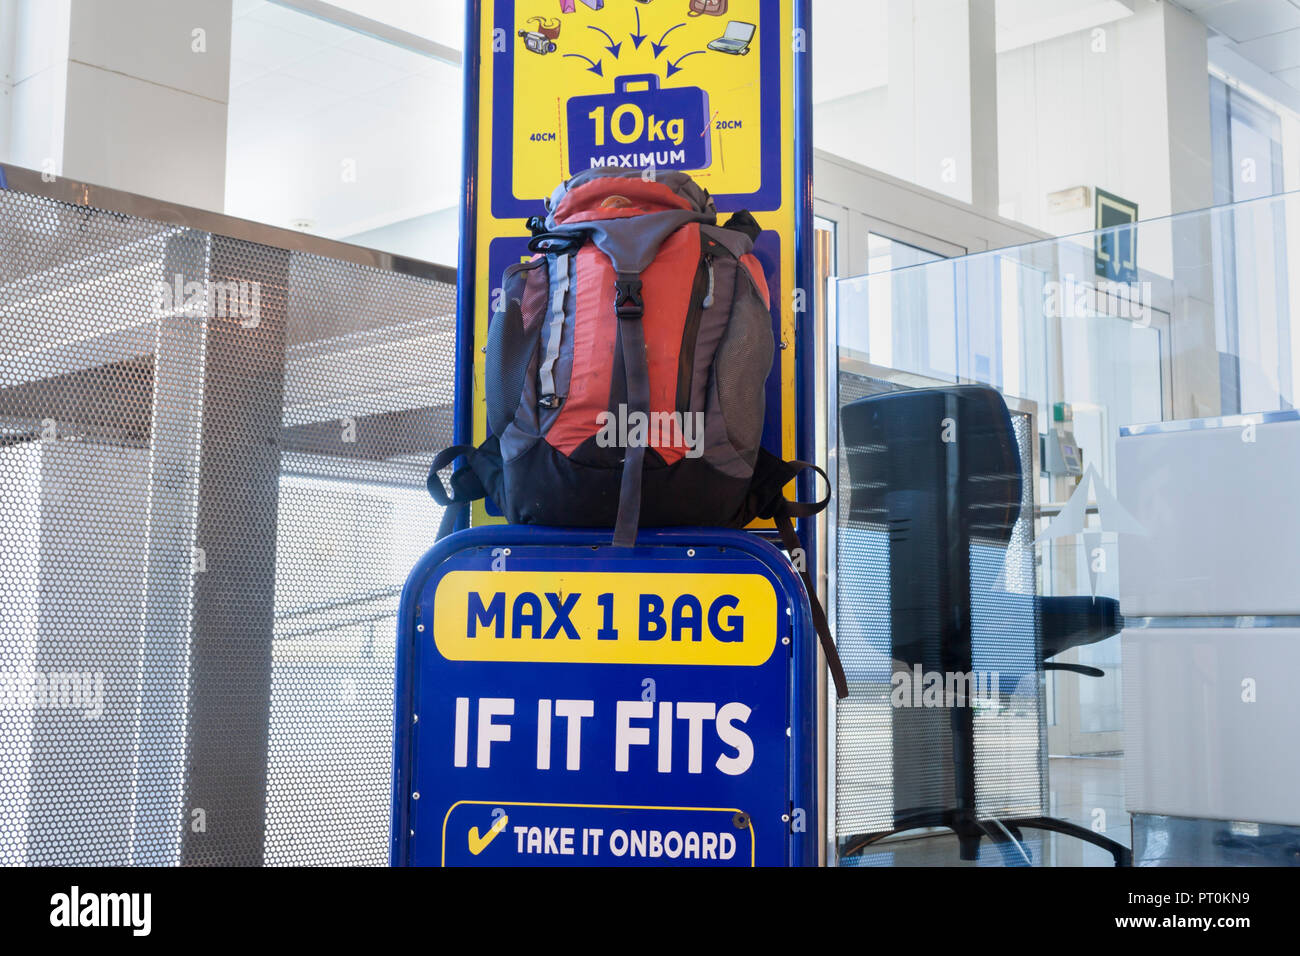 Ryanair Handgepäck/Gepäck größe Checker. Stockbild